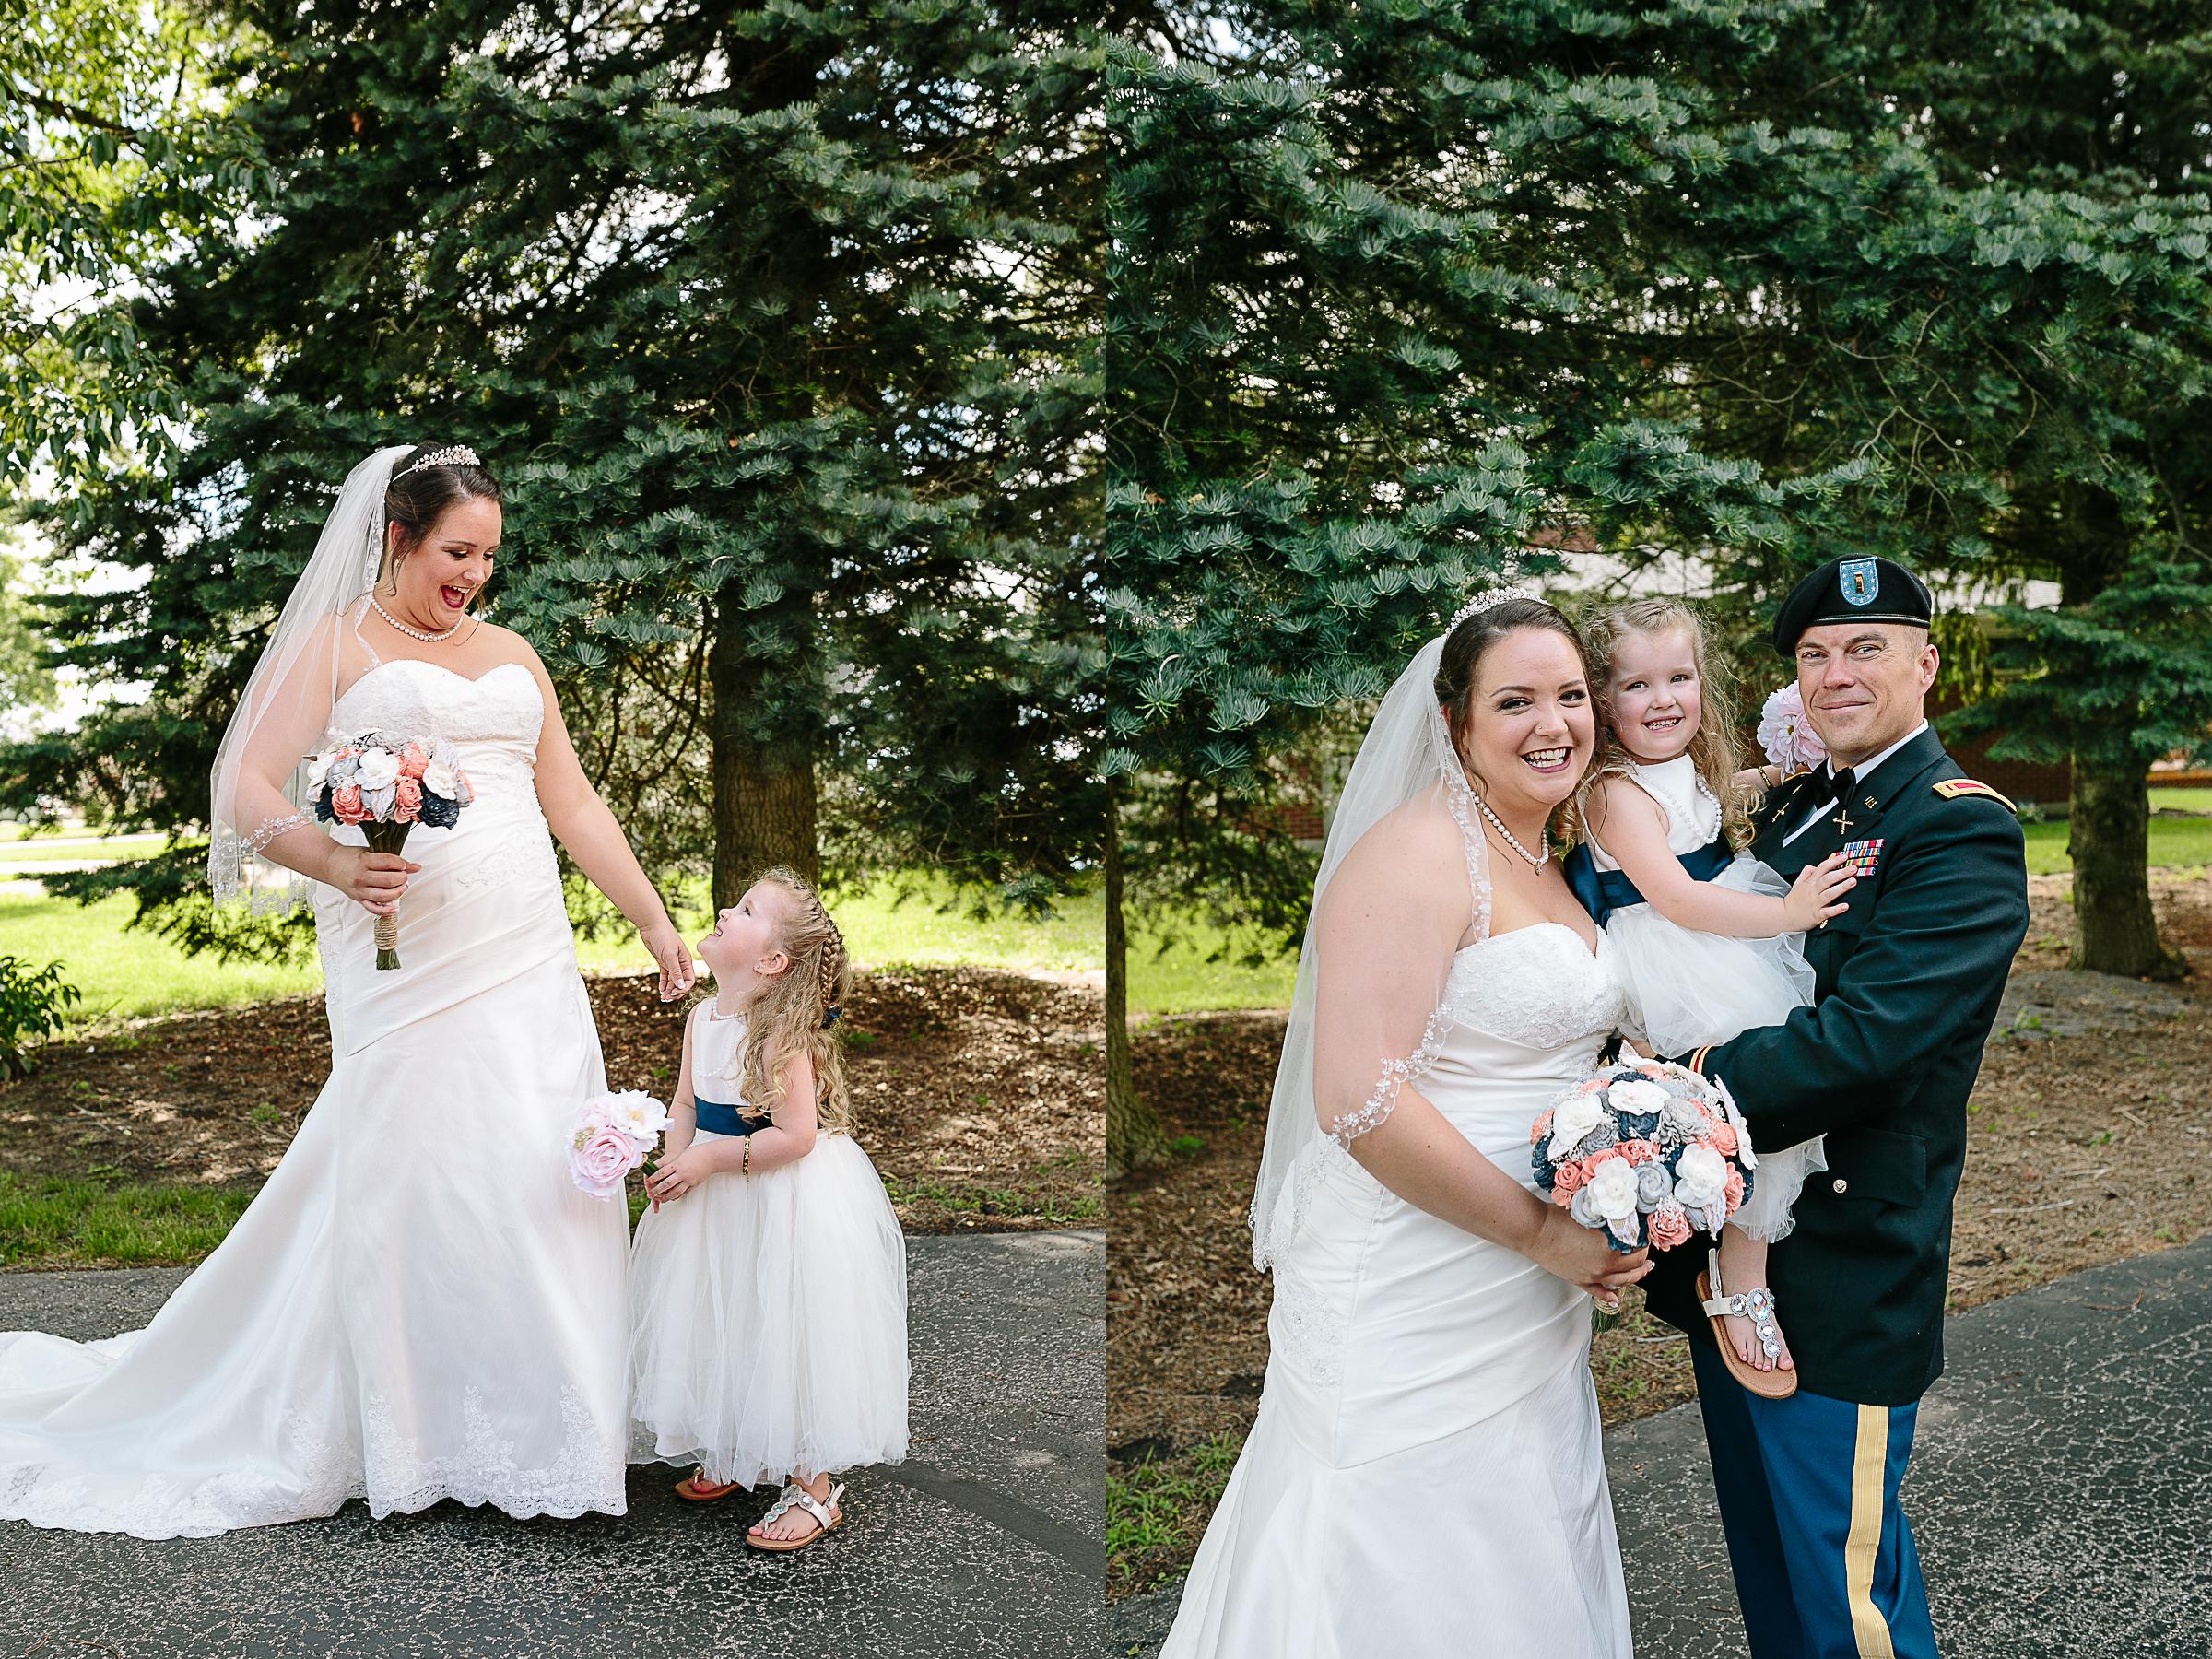 Bride and Groom with Cute Flower Girl Daughter.jpg